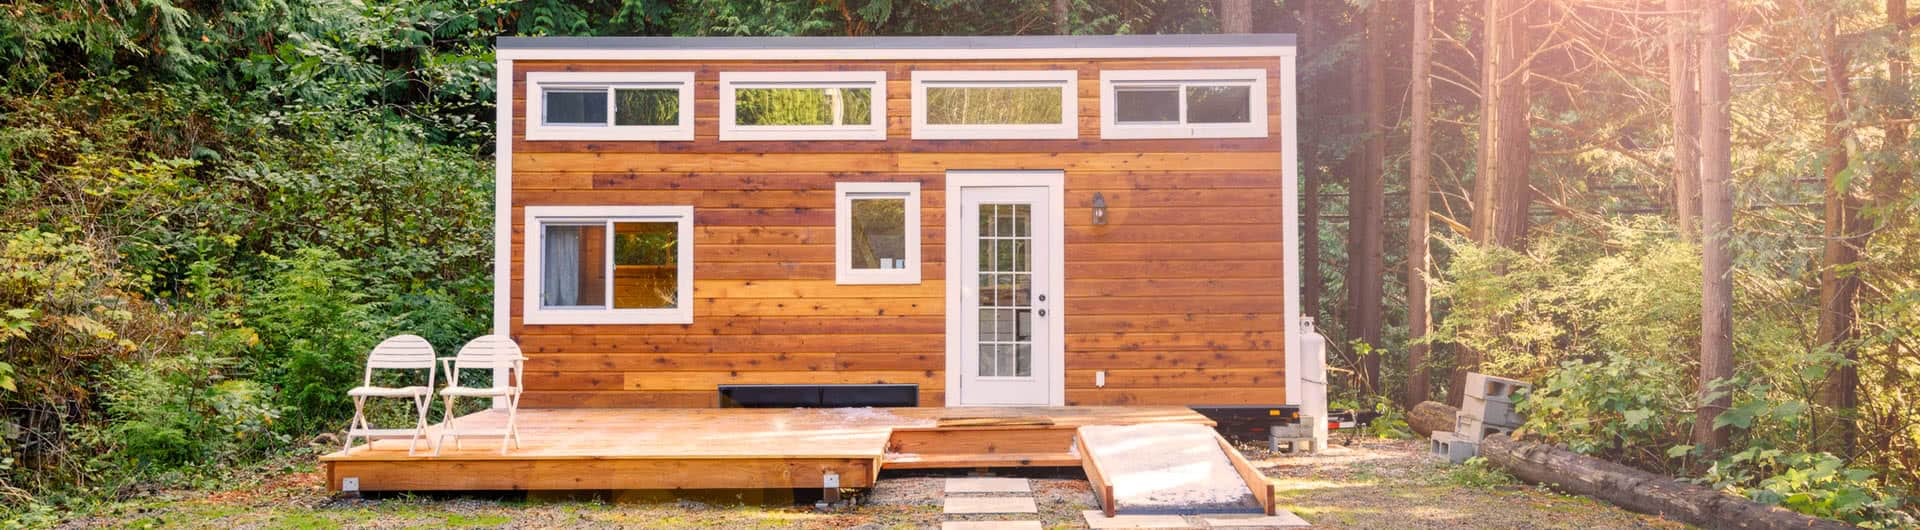 Tiny houses – Ein günstiger Weg ins Eigenheim?